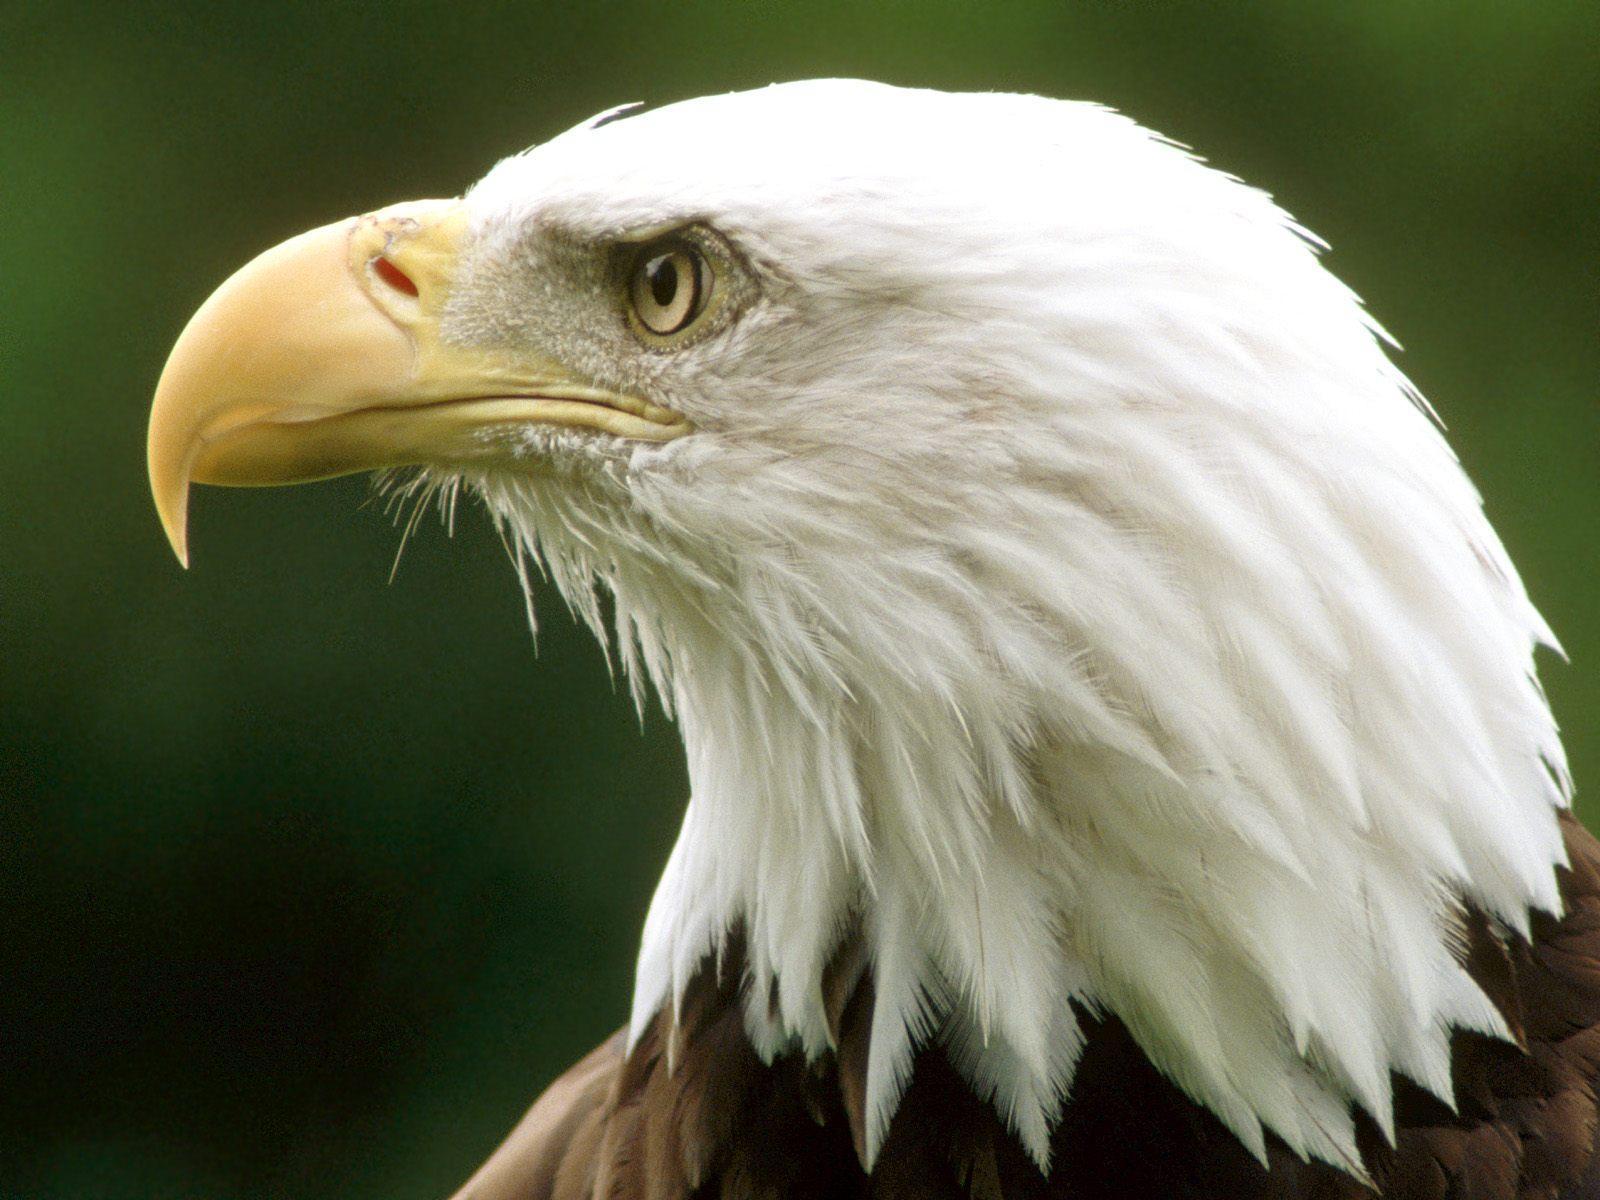 http://4.bp.blogspot.com/-envzXg-wByk/TjmRvQuLiII/AAAAAAAAAPM/FYaXC13vv9o/s1600/Bald+Eagle+Wallpapers+8.jpg